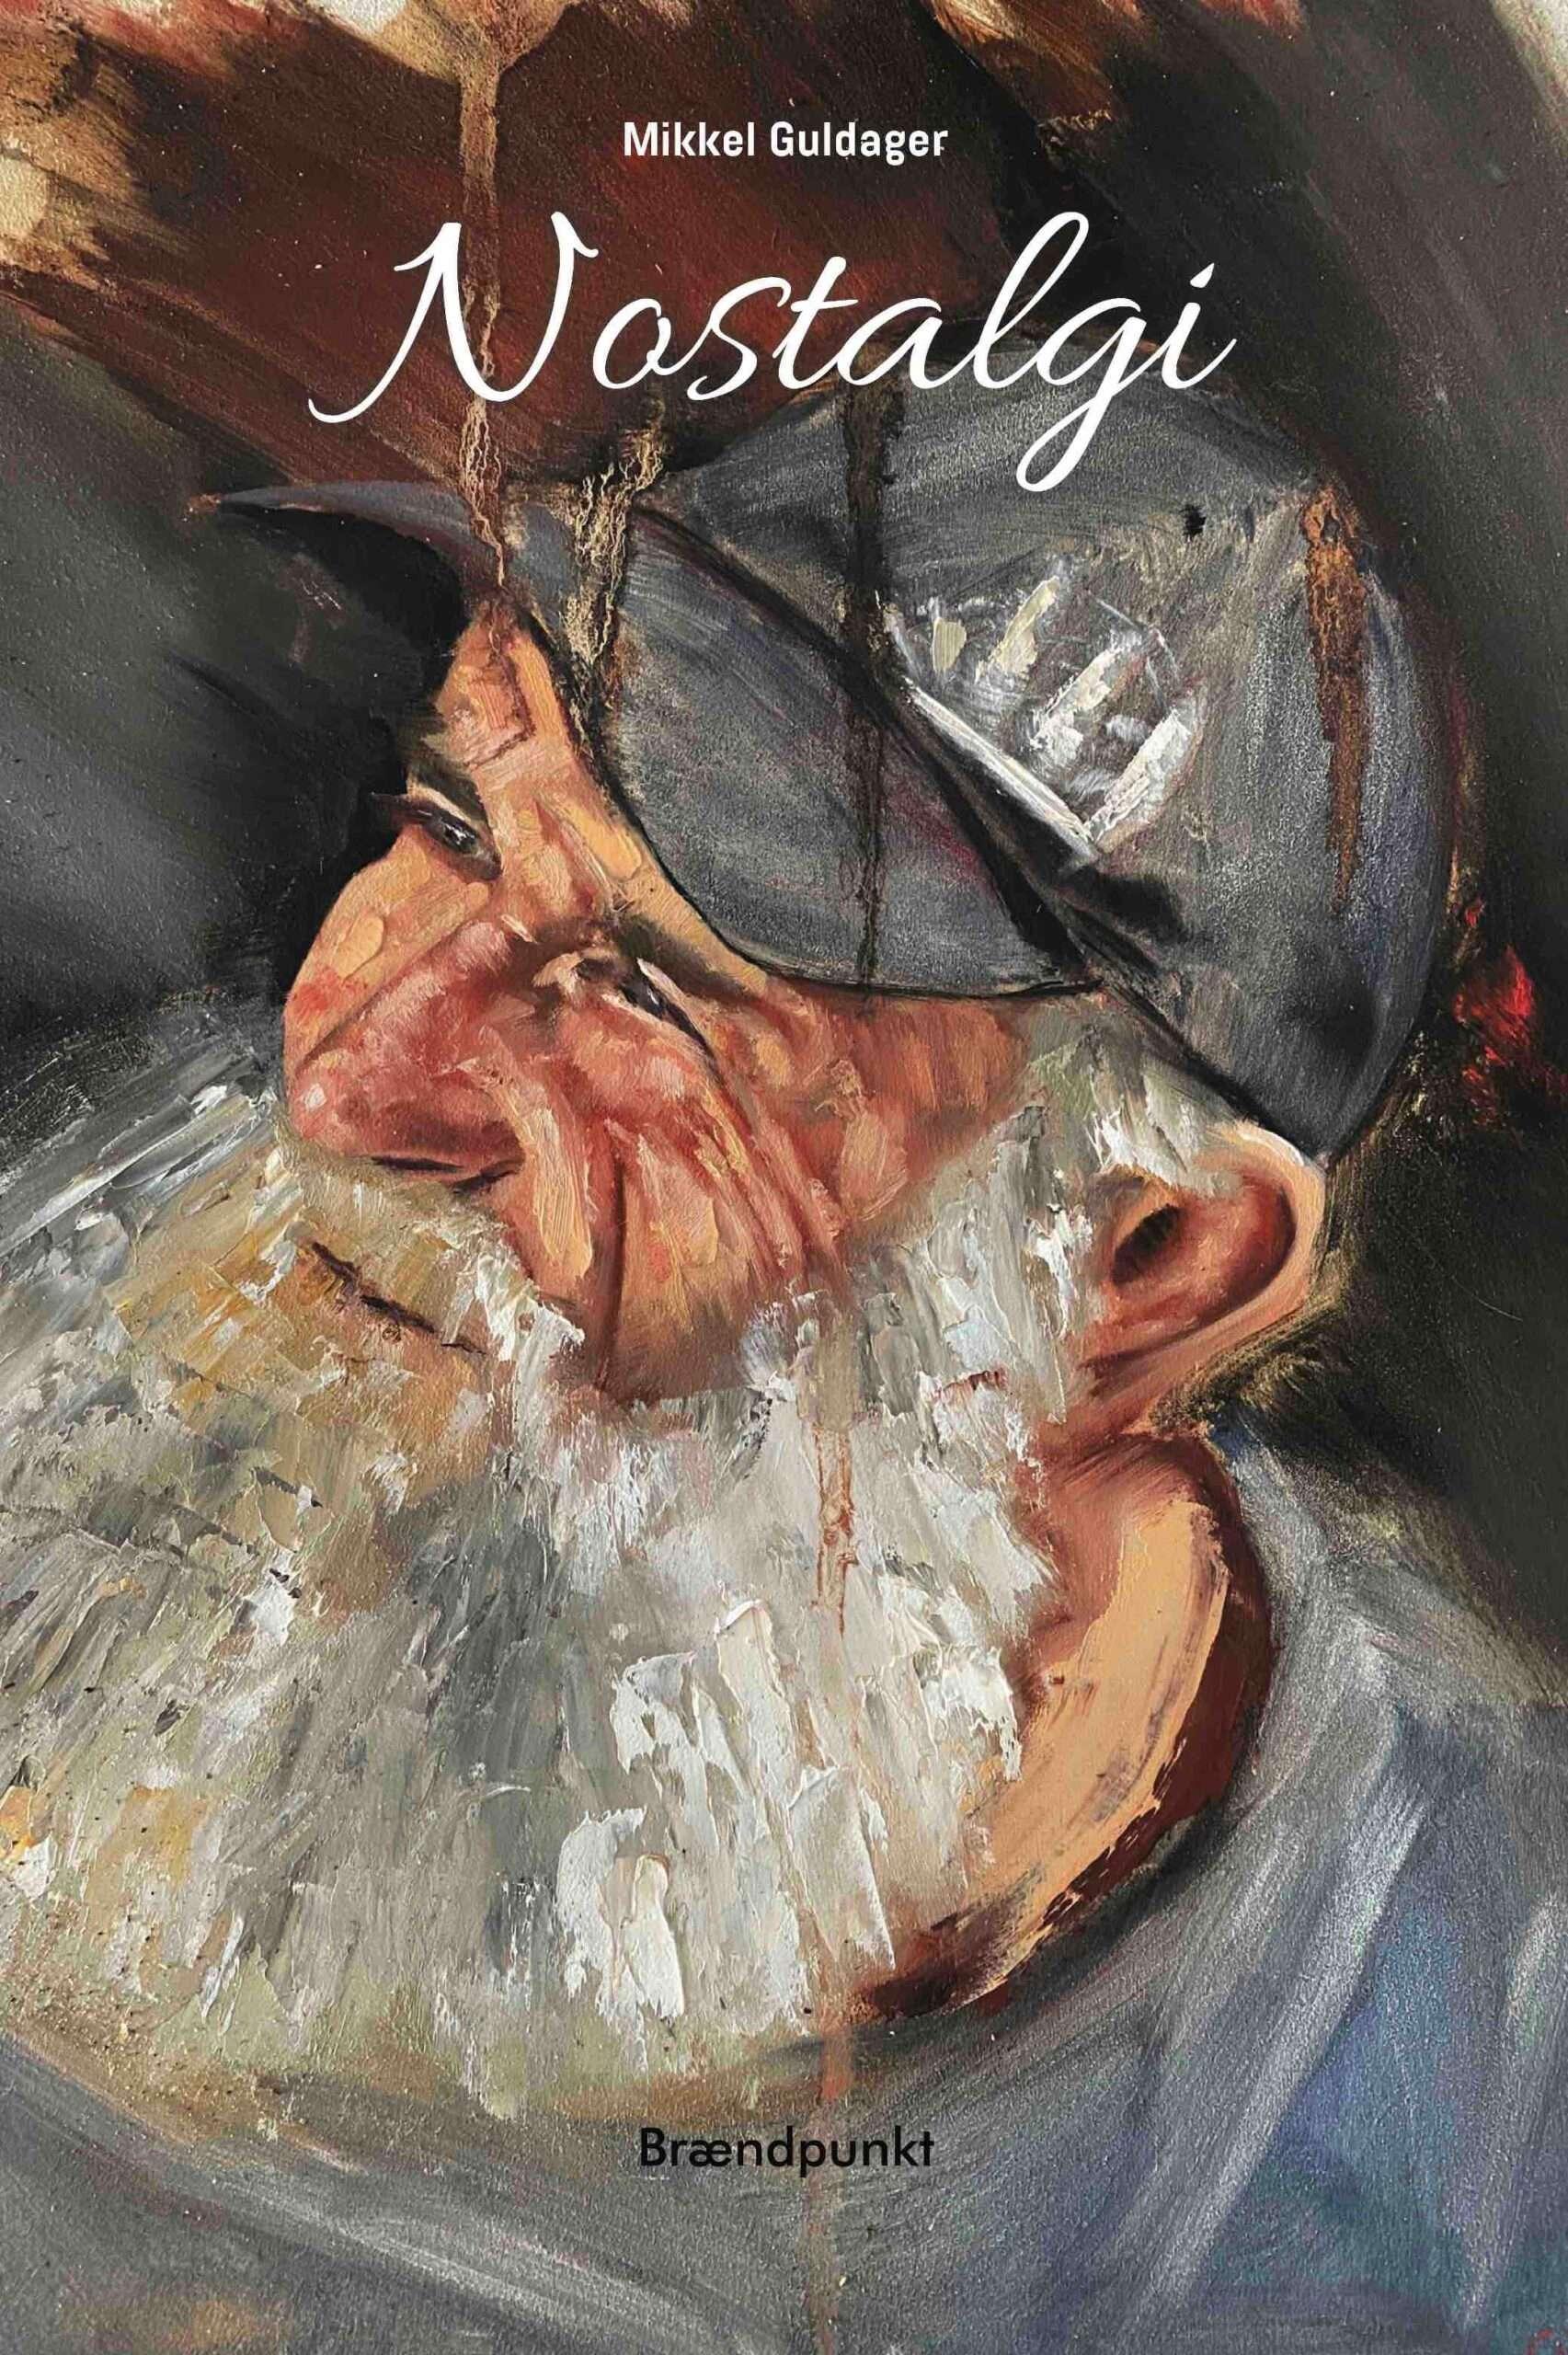 book review Nostalgi Mikkel Guldager